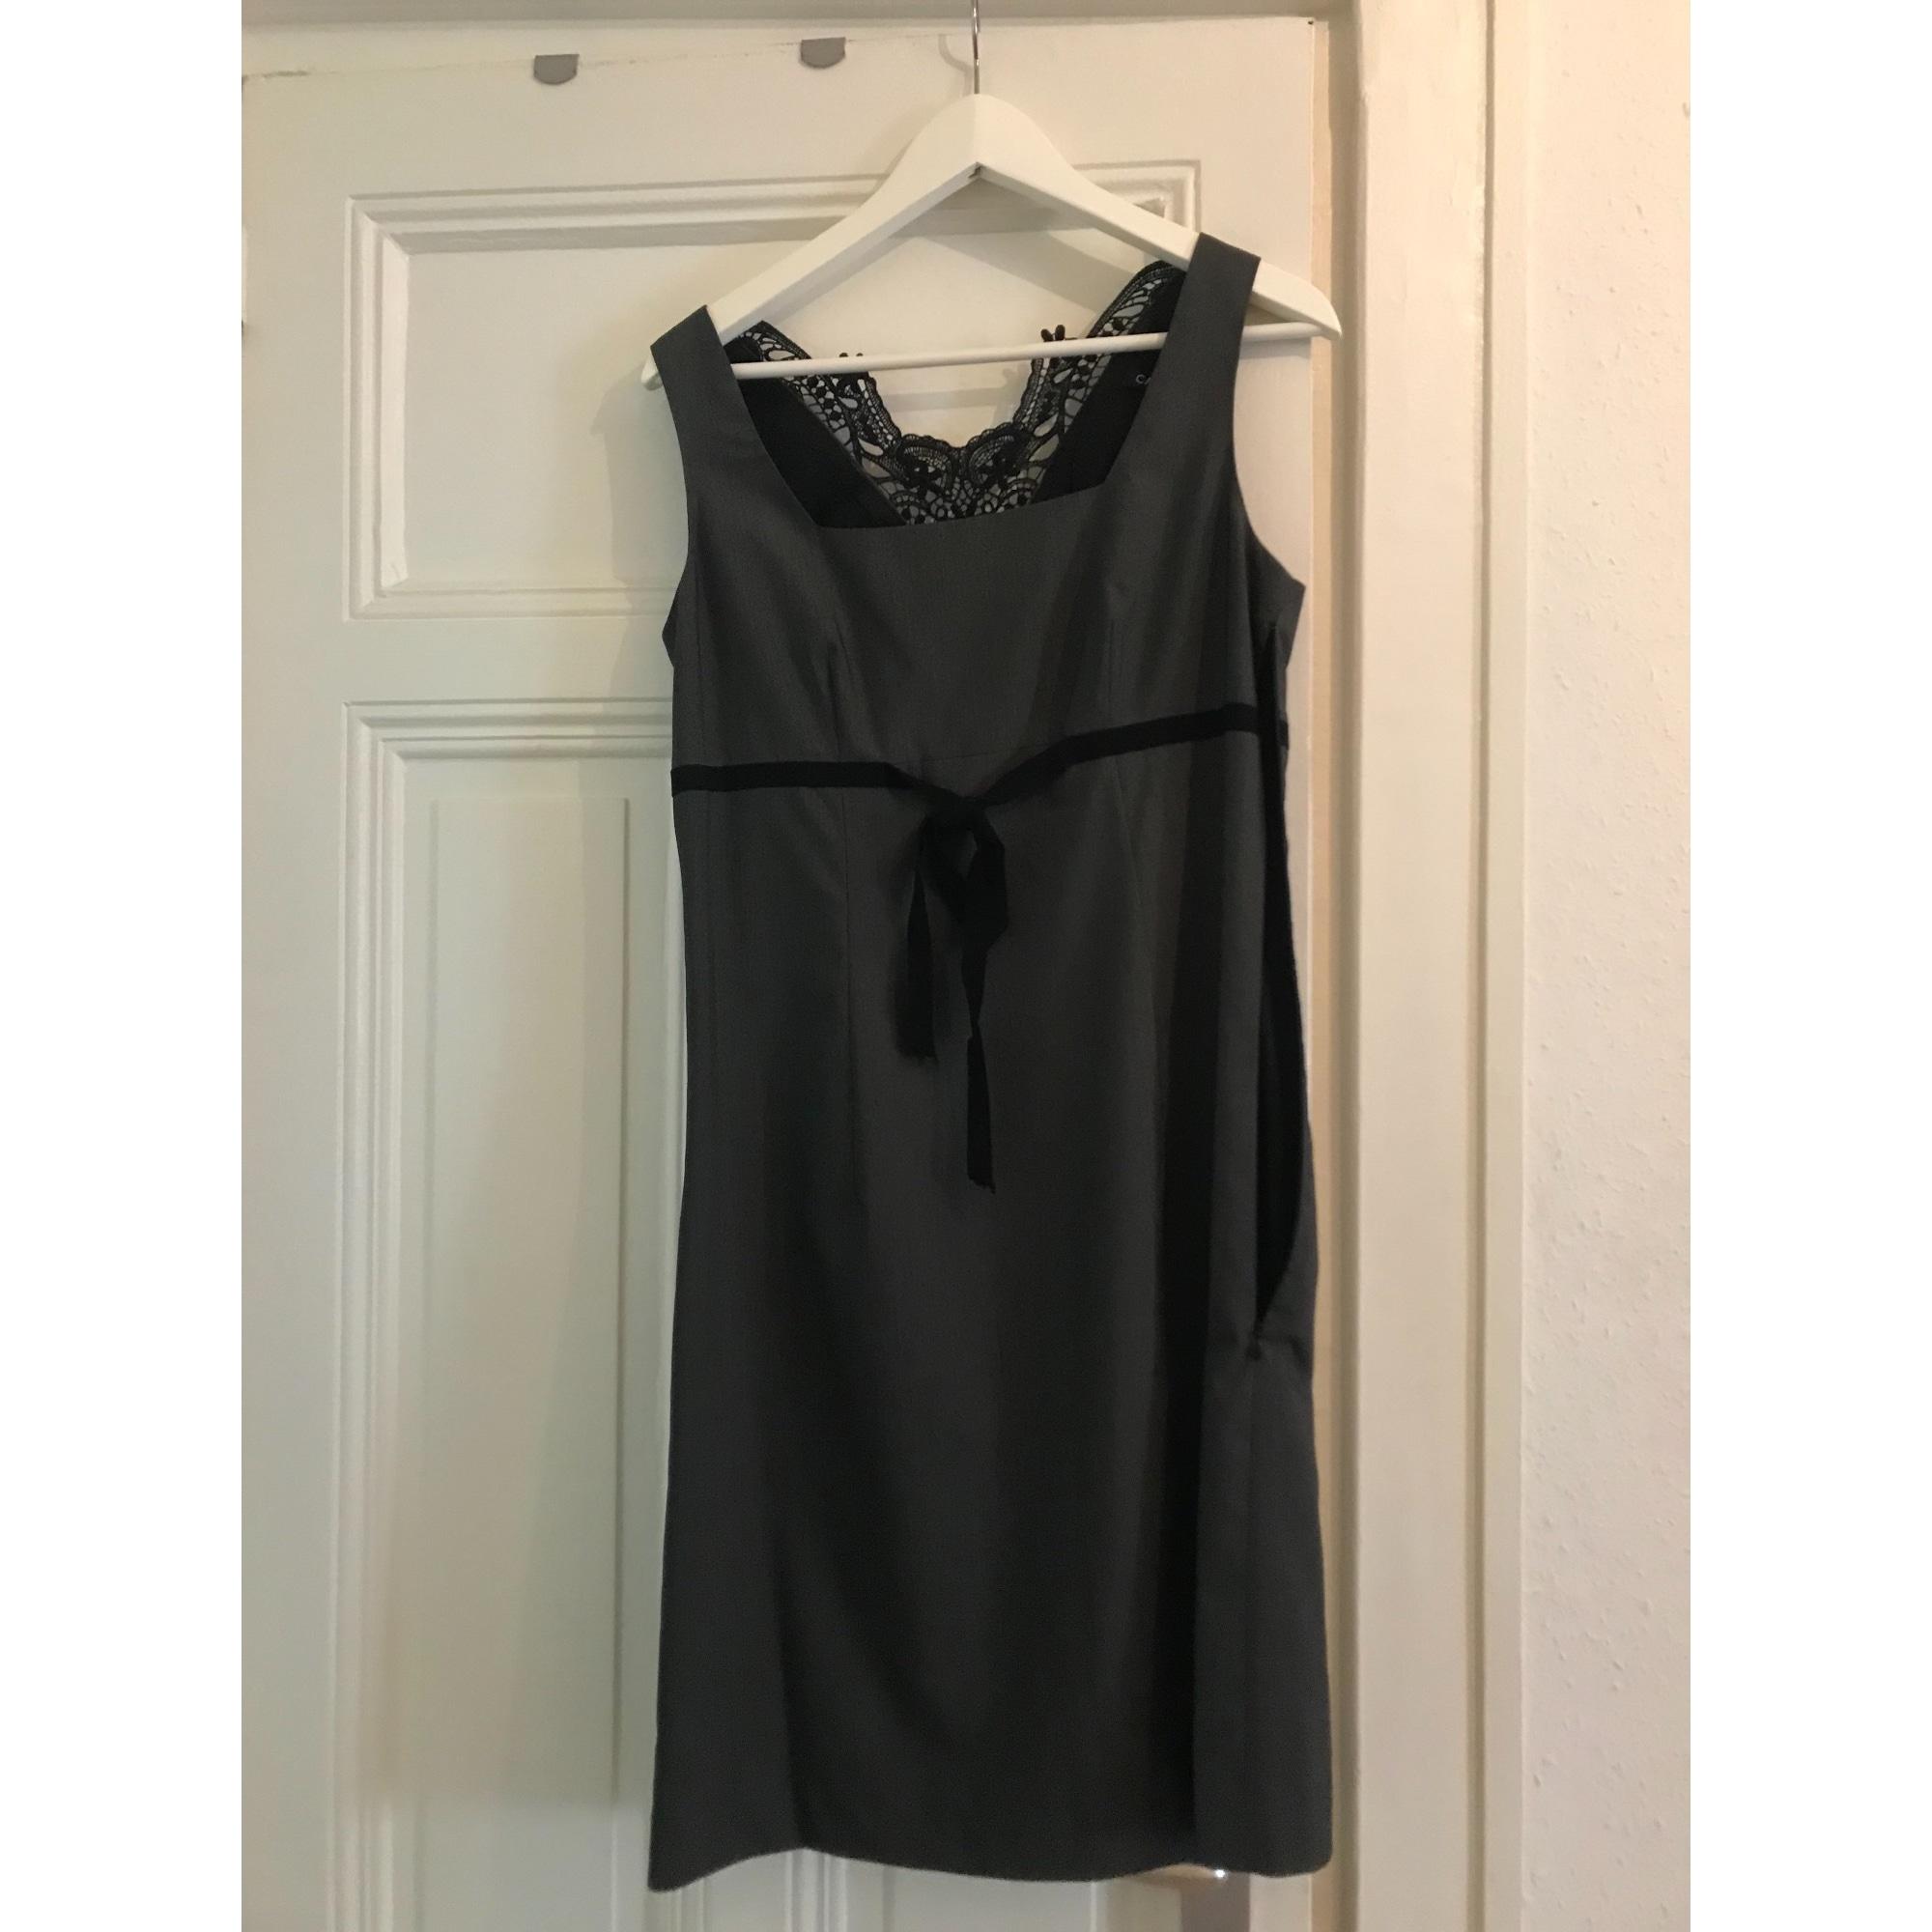 Tailleur robe CAROLL Gris, anthracite